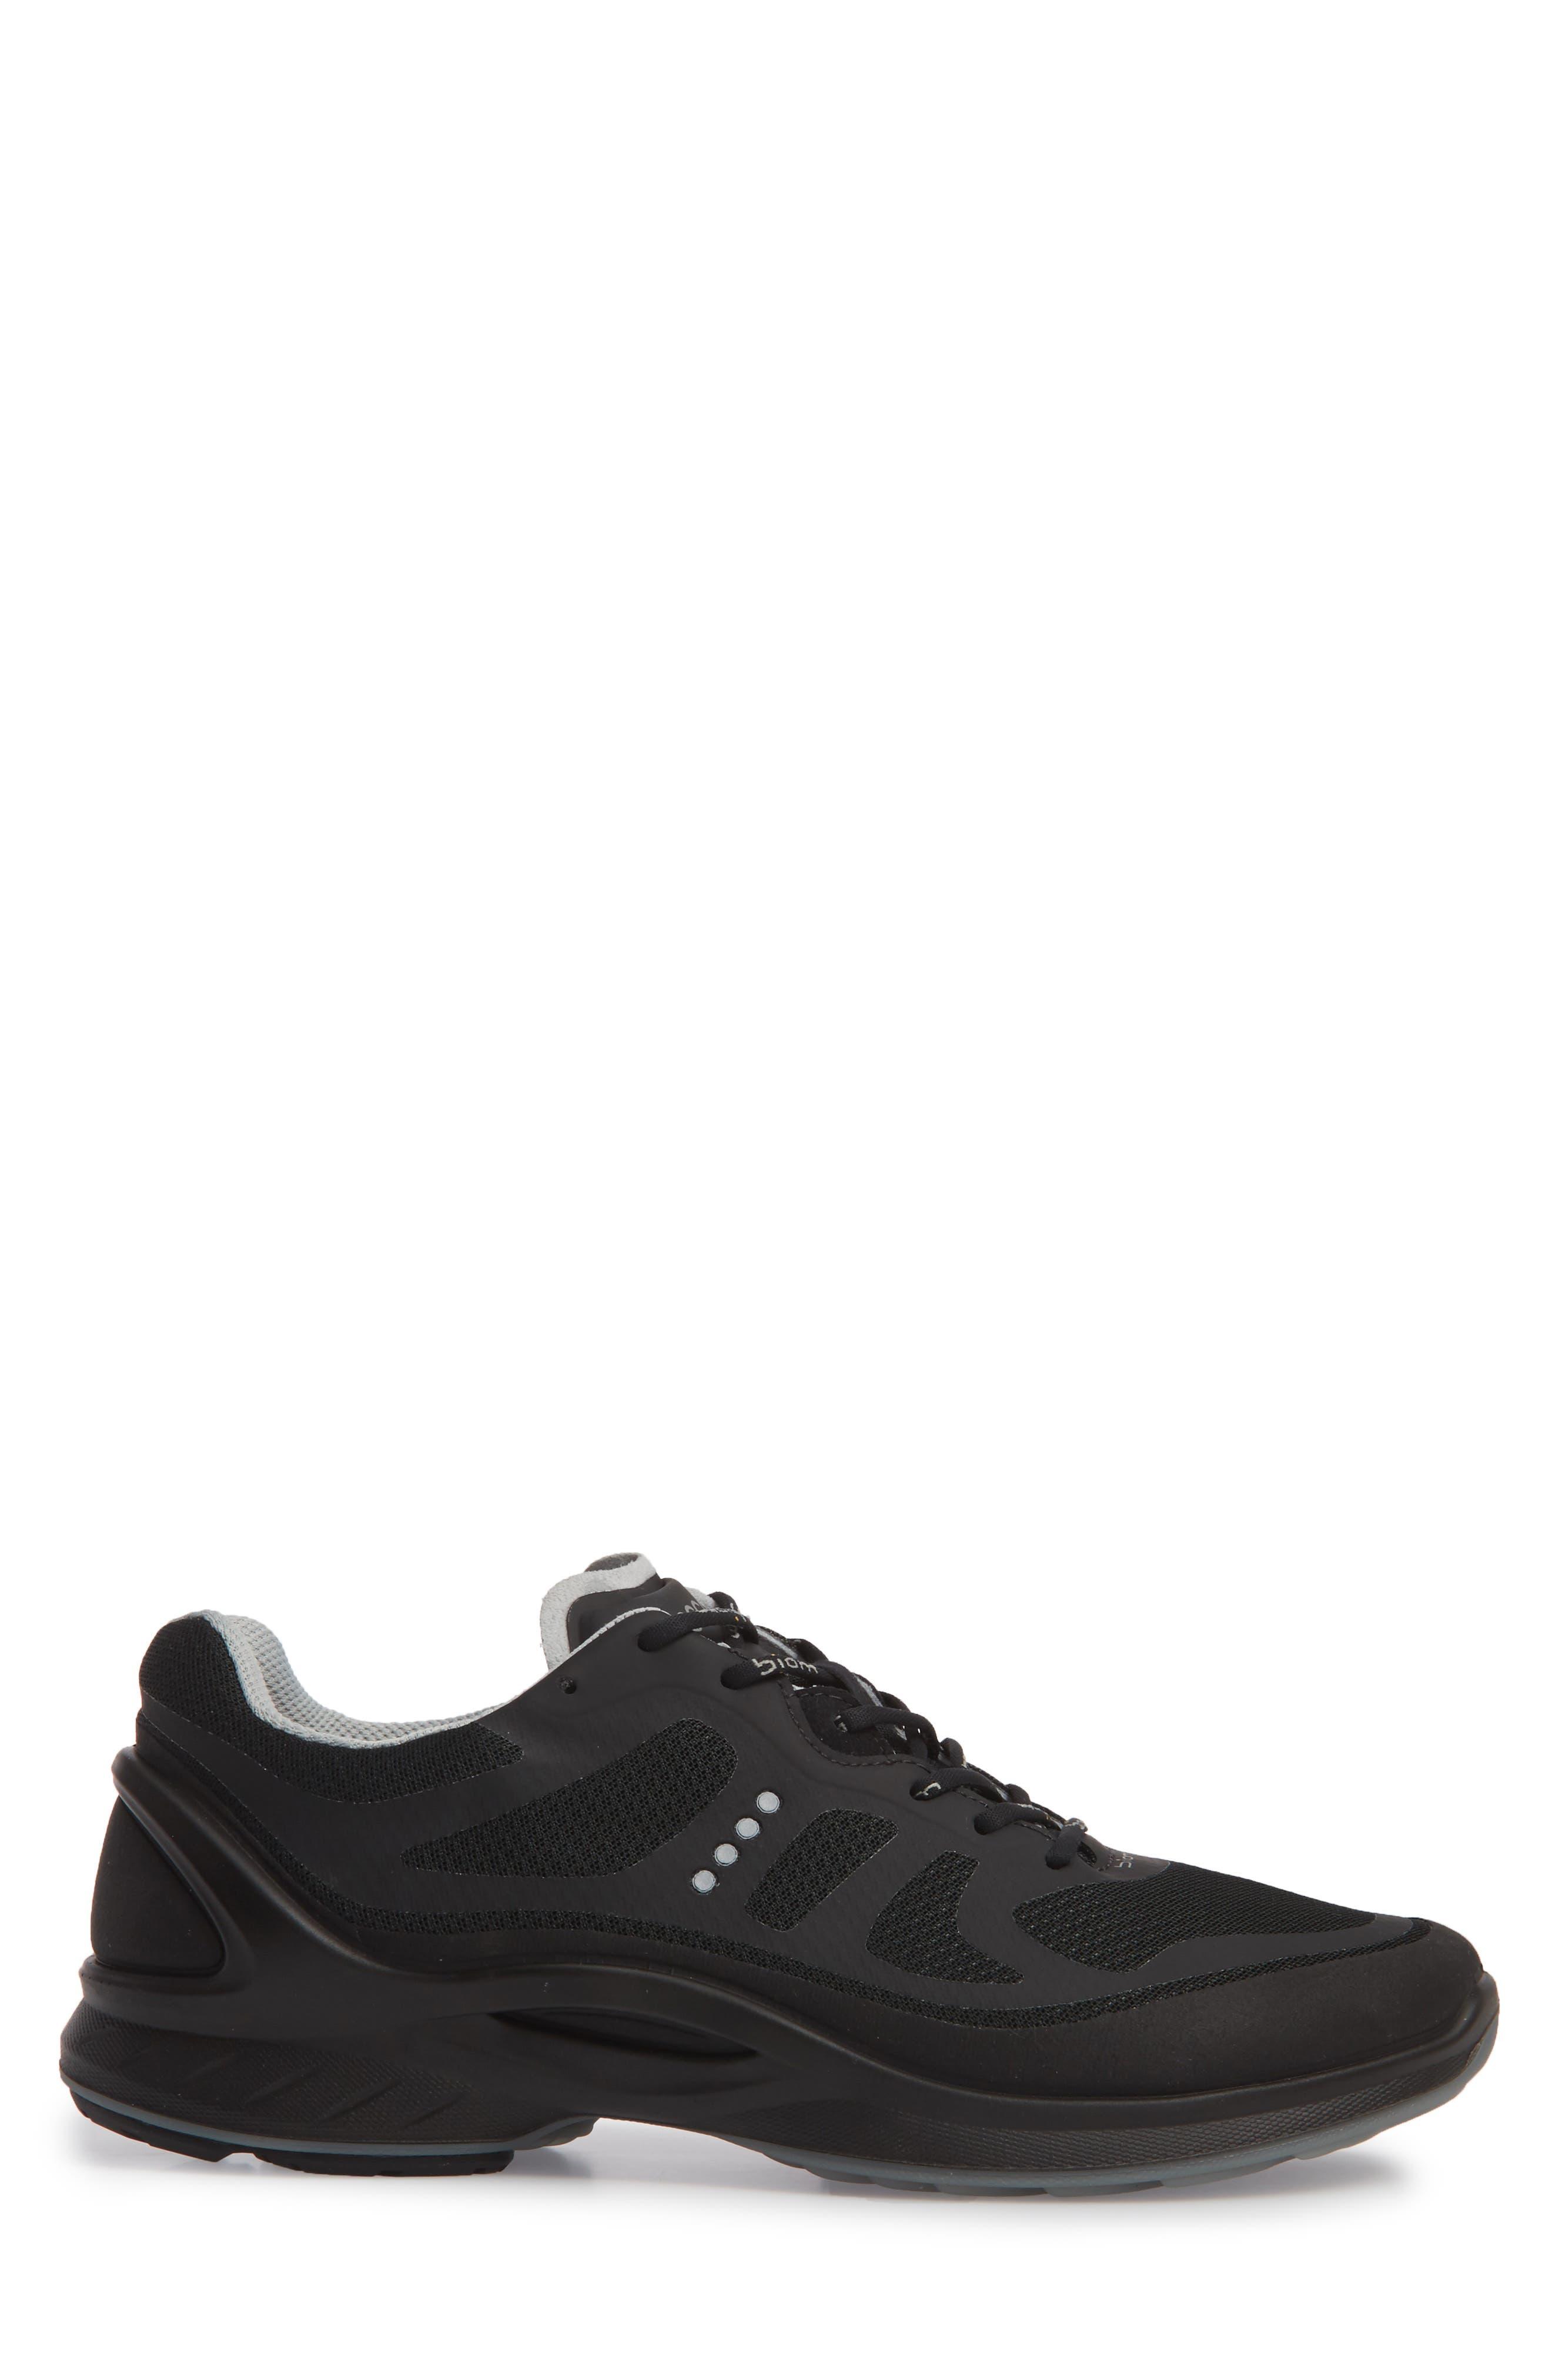 BIOM Fjuel Tie Sneaker,                             Alternate thumbnail 3, color,                             009